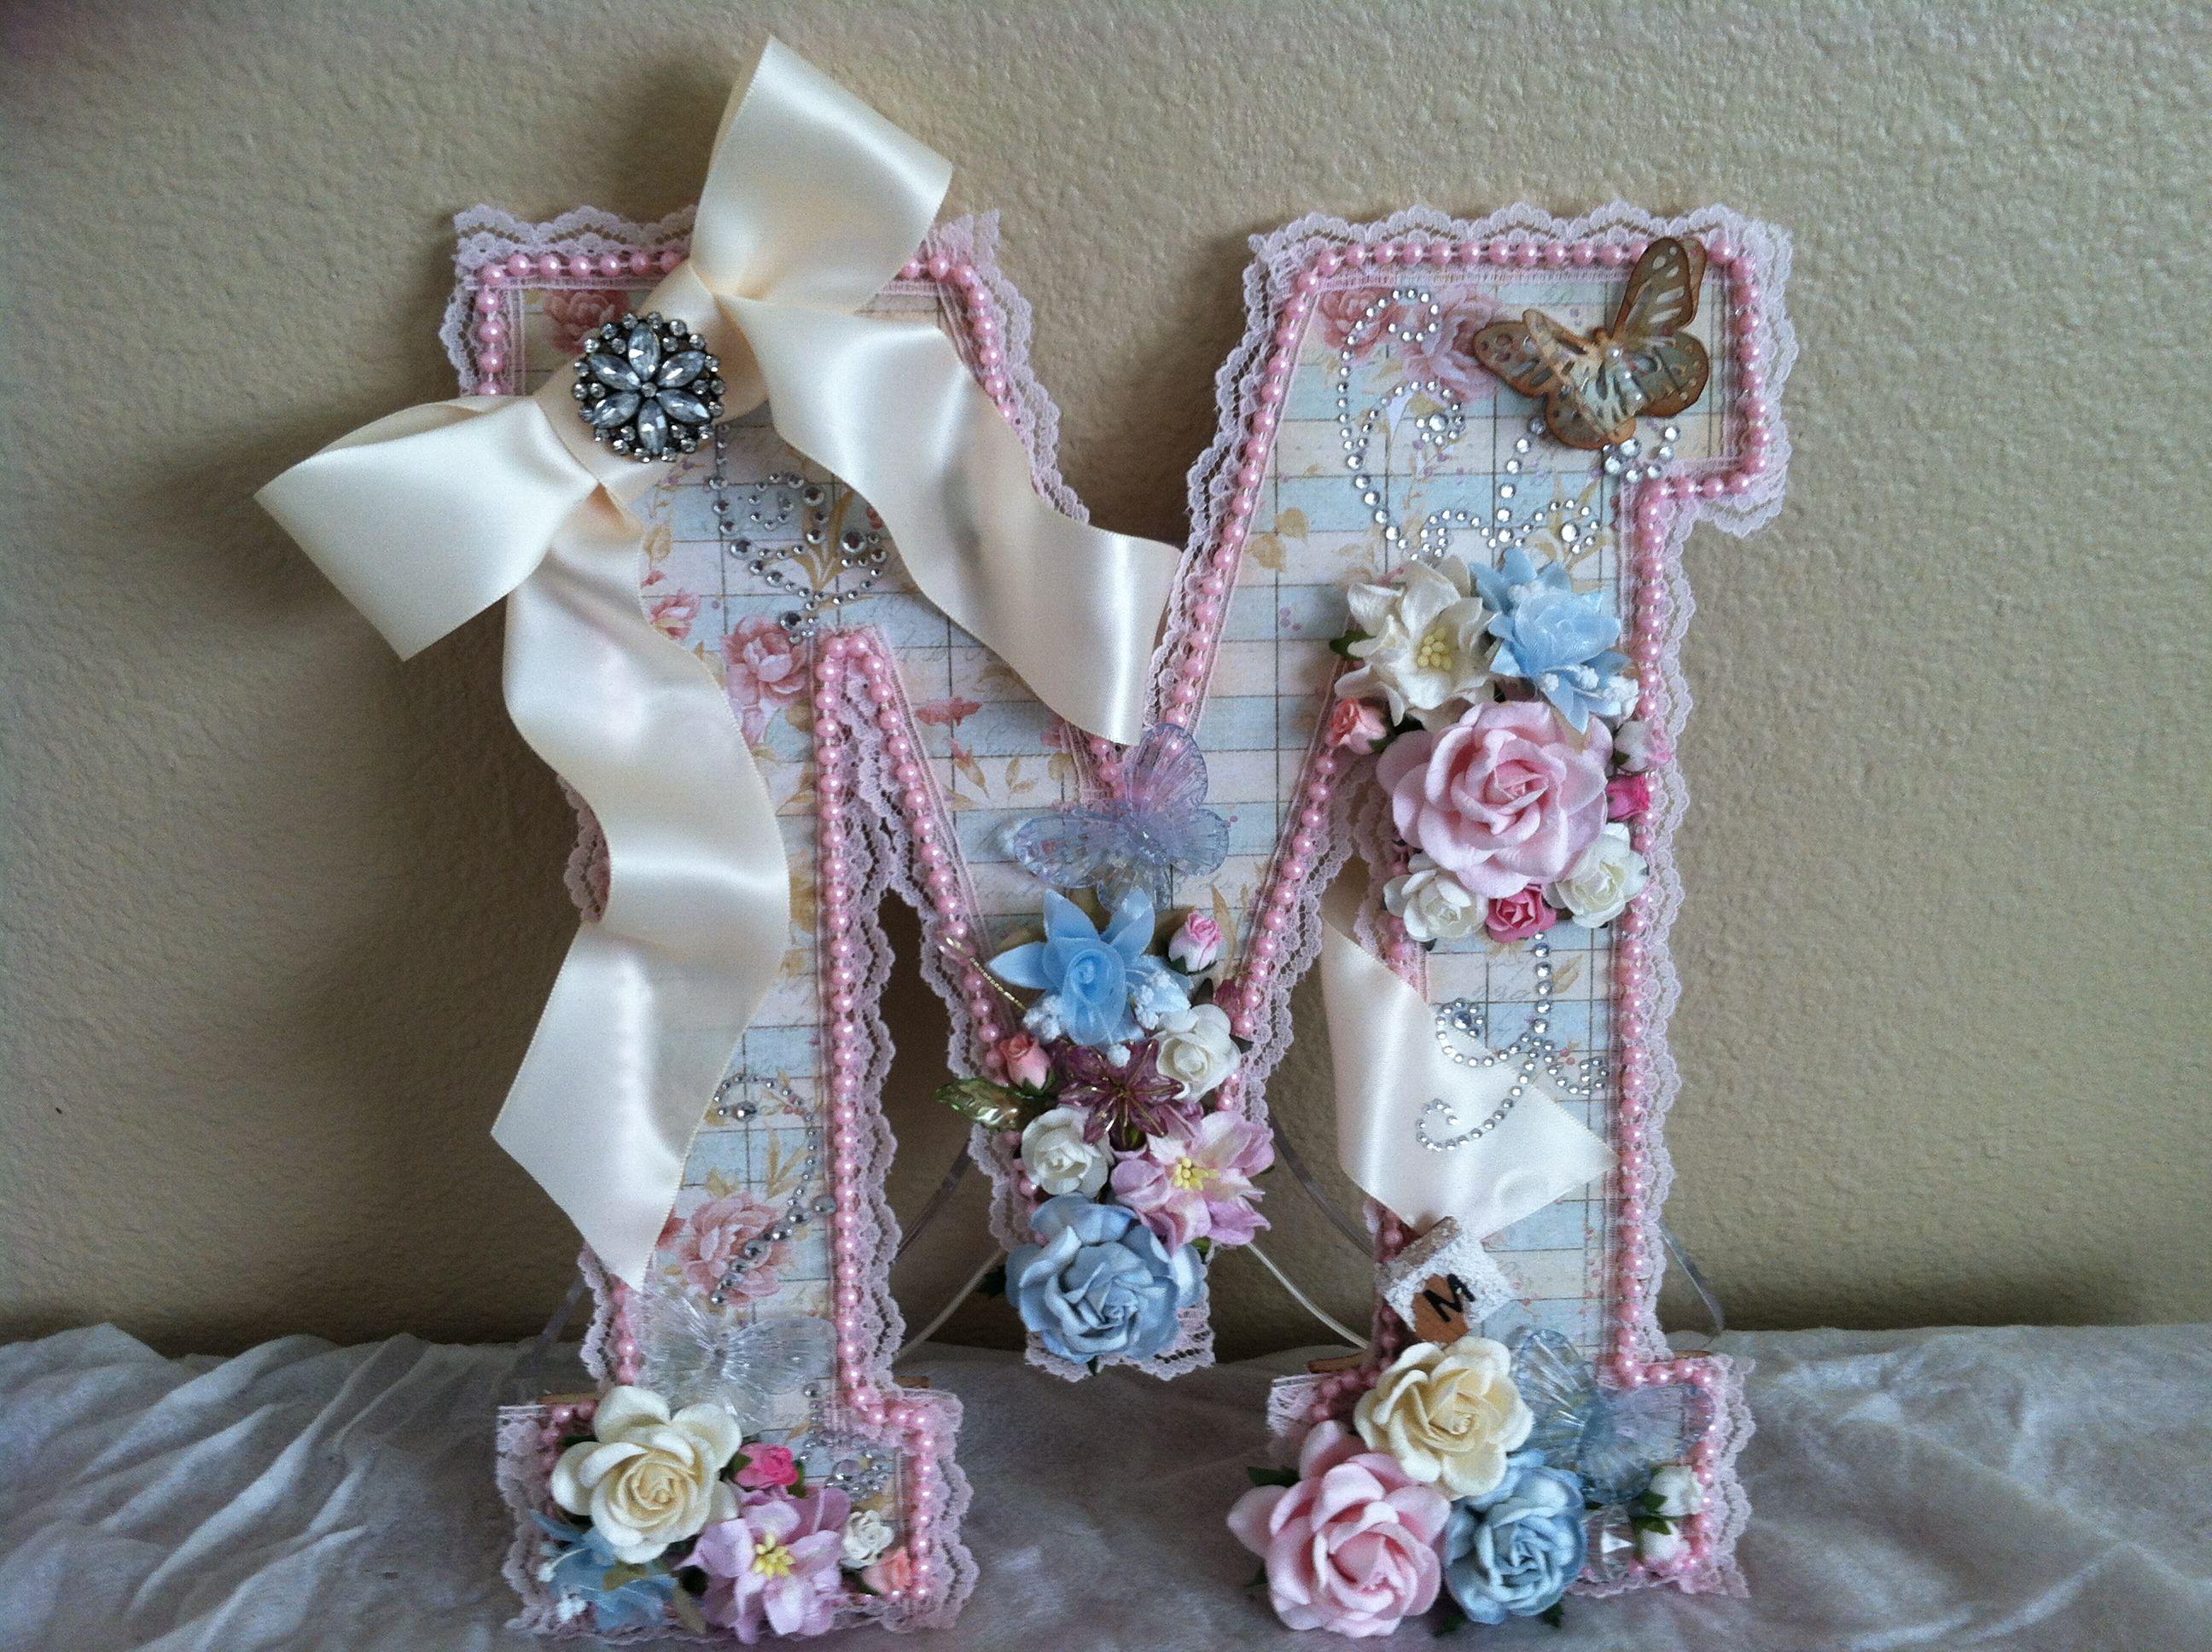 Altered Letter Swtlady1 On Yt Letter A Crafts Bling Crafts